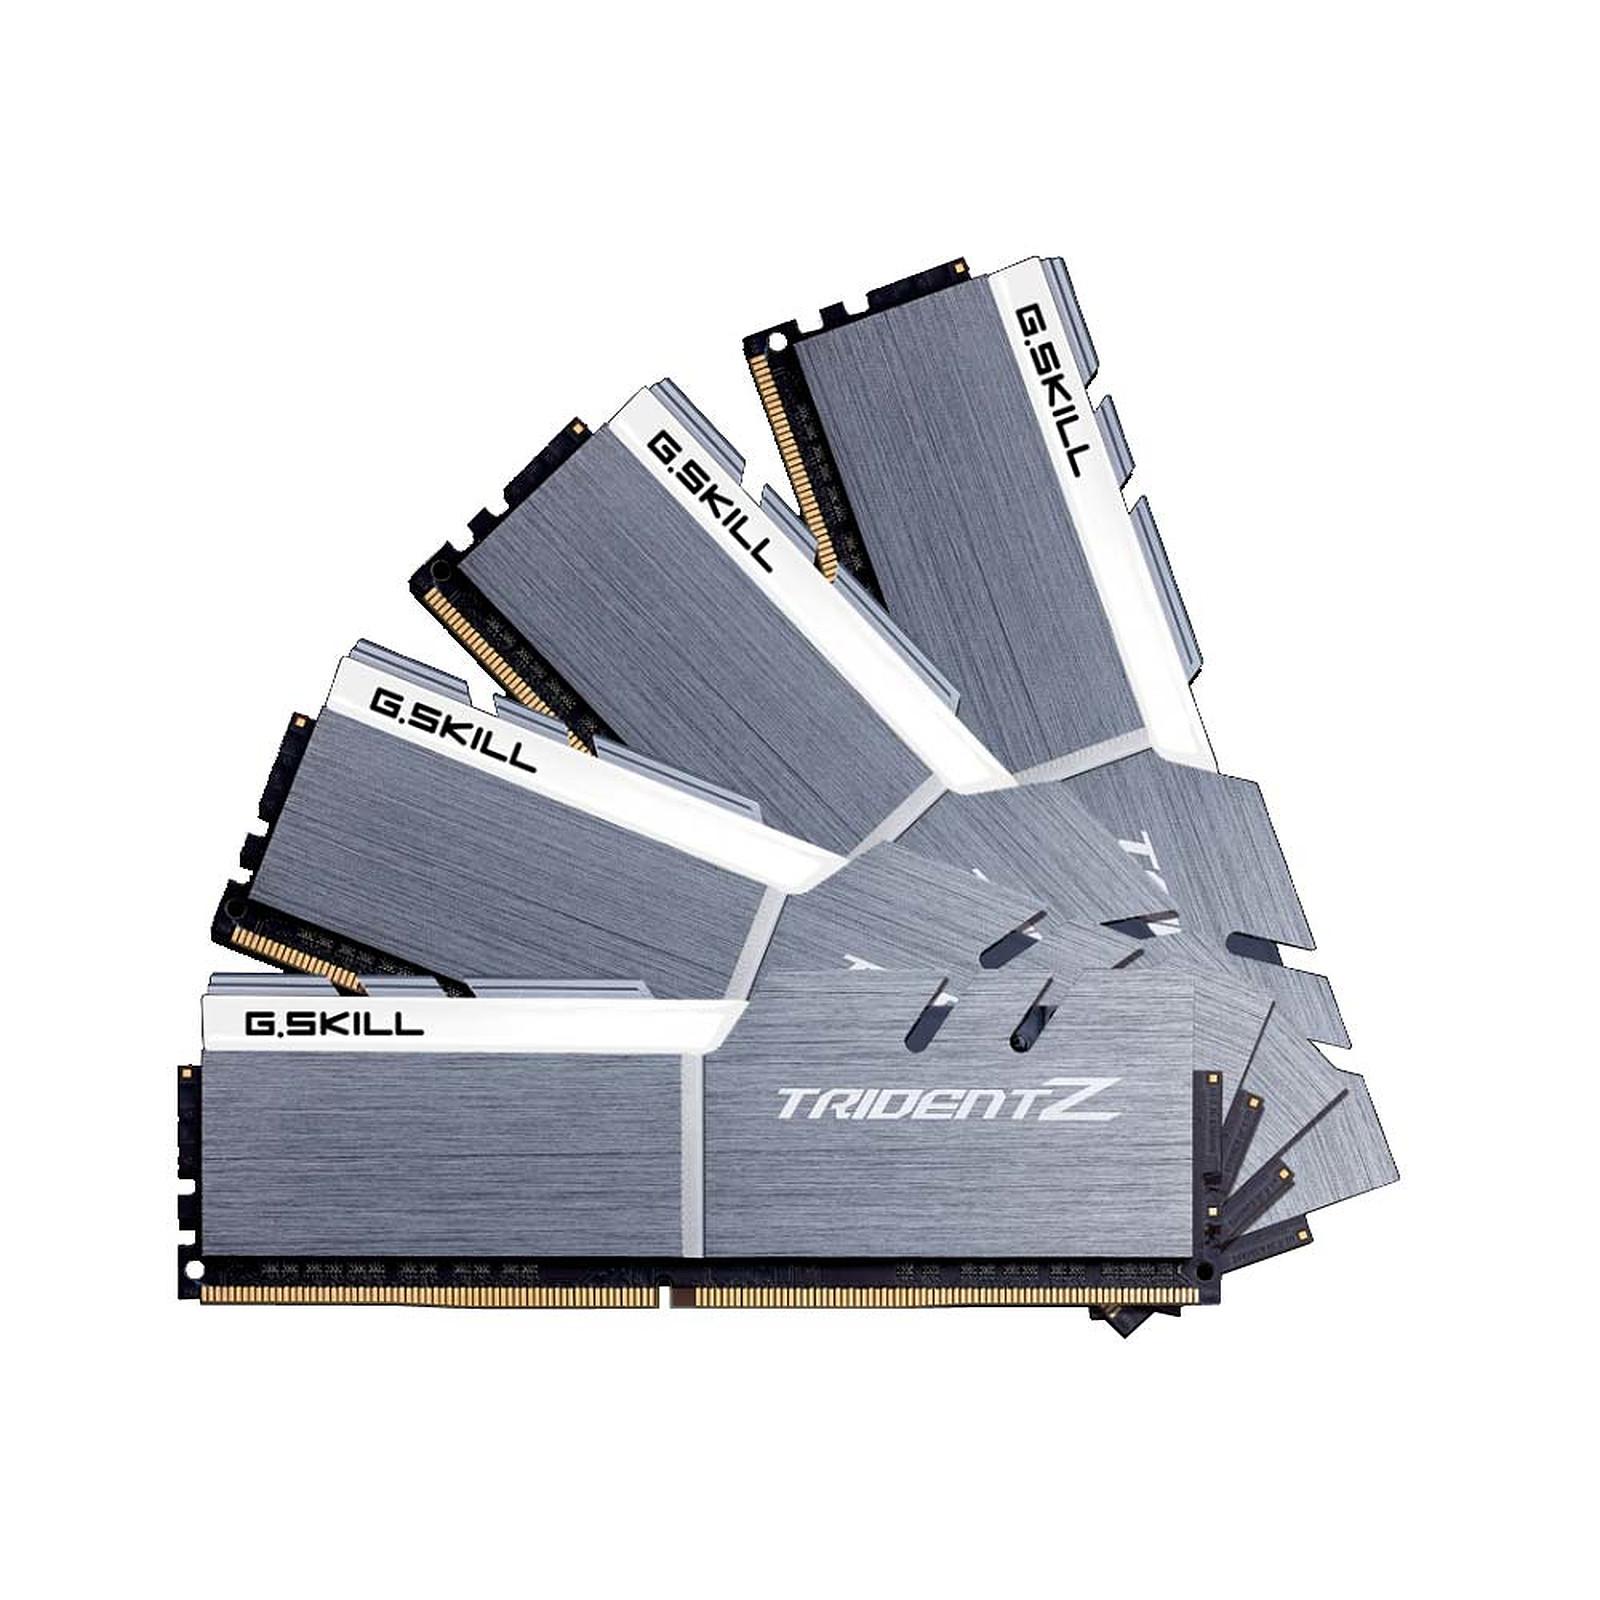 G.Skill Trident Z 64 Go (4x 16 Go) DDR4 3300 MHz CL16